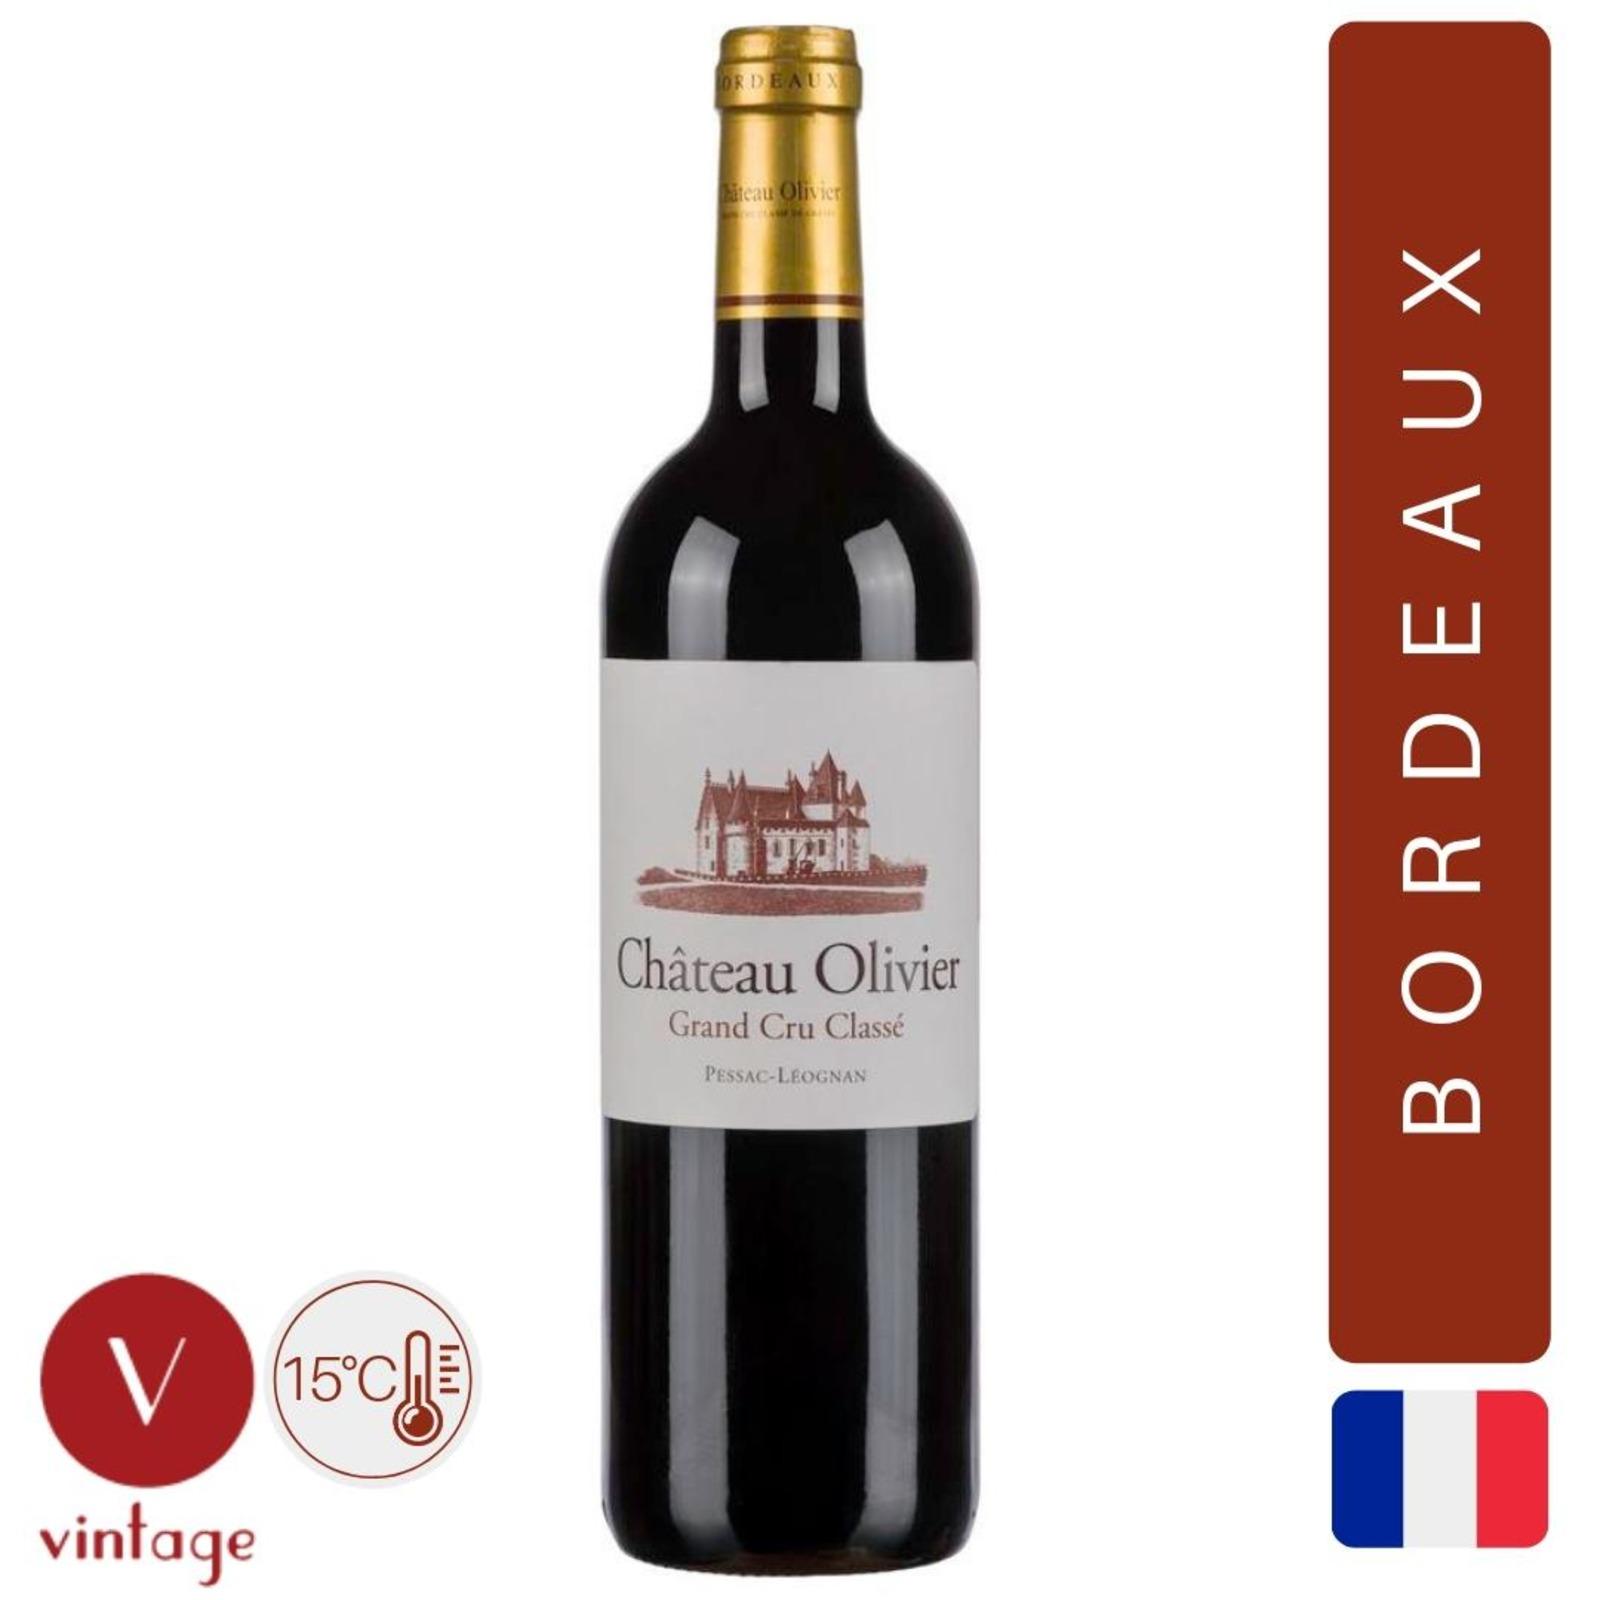 Chateau Olivier - Pessac Leognan - Red Wine